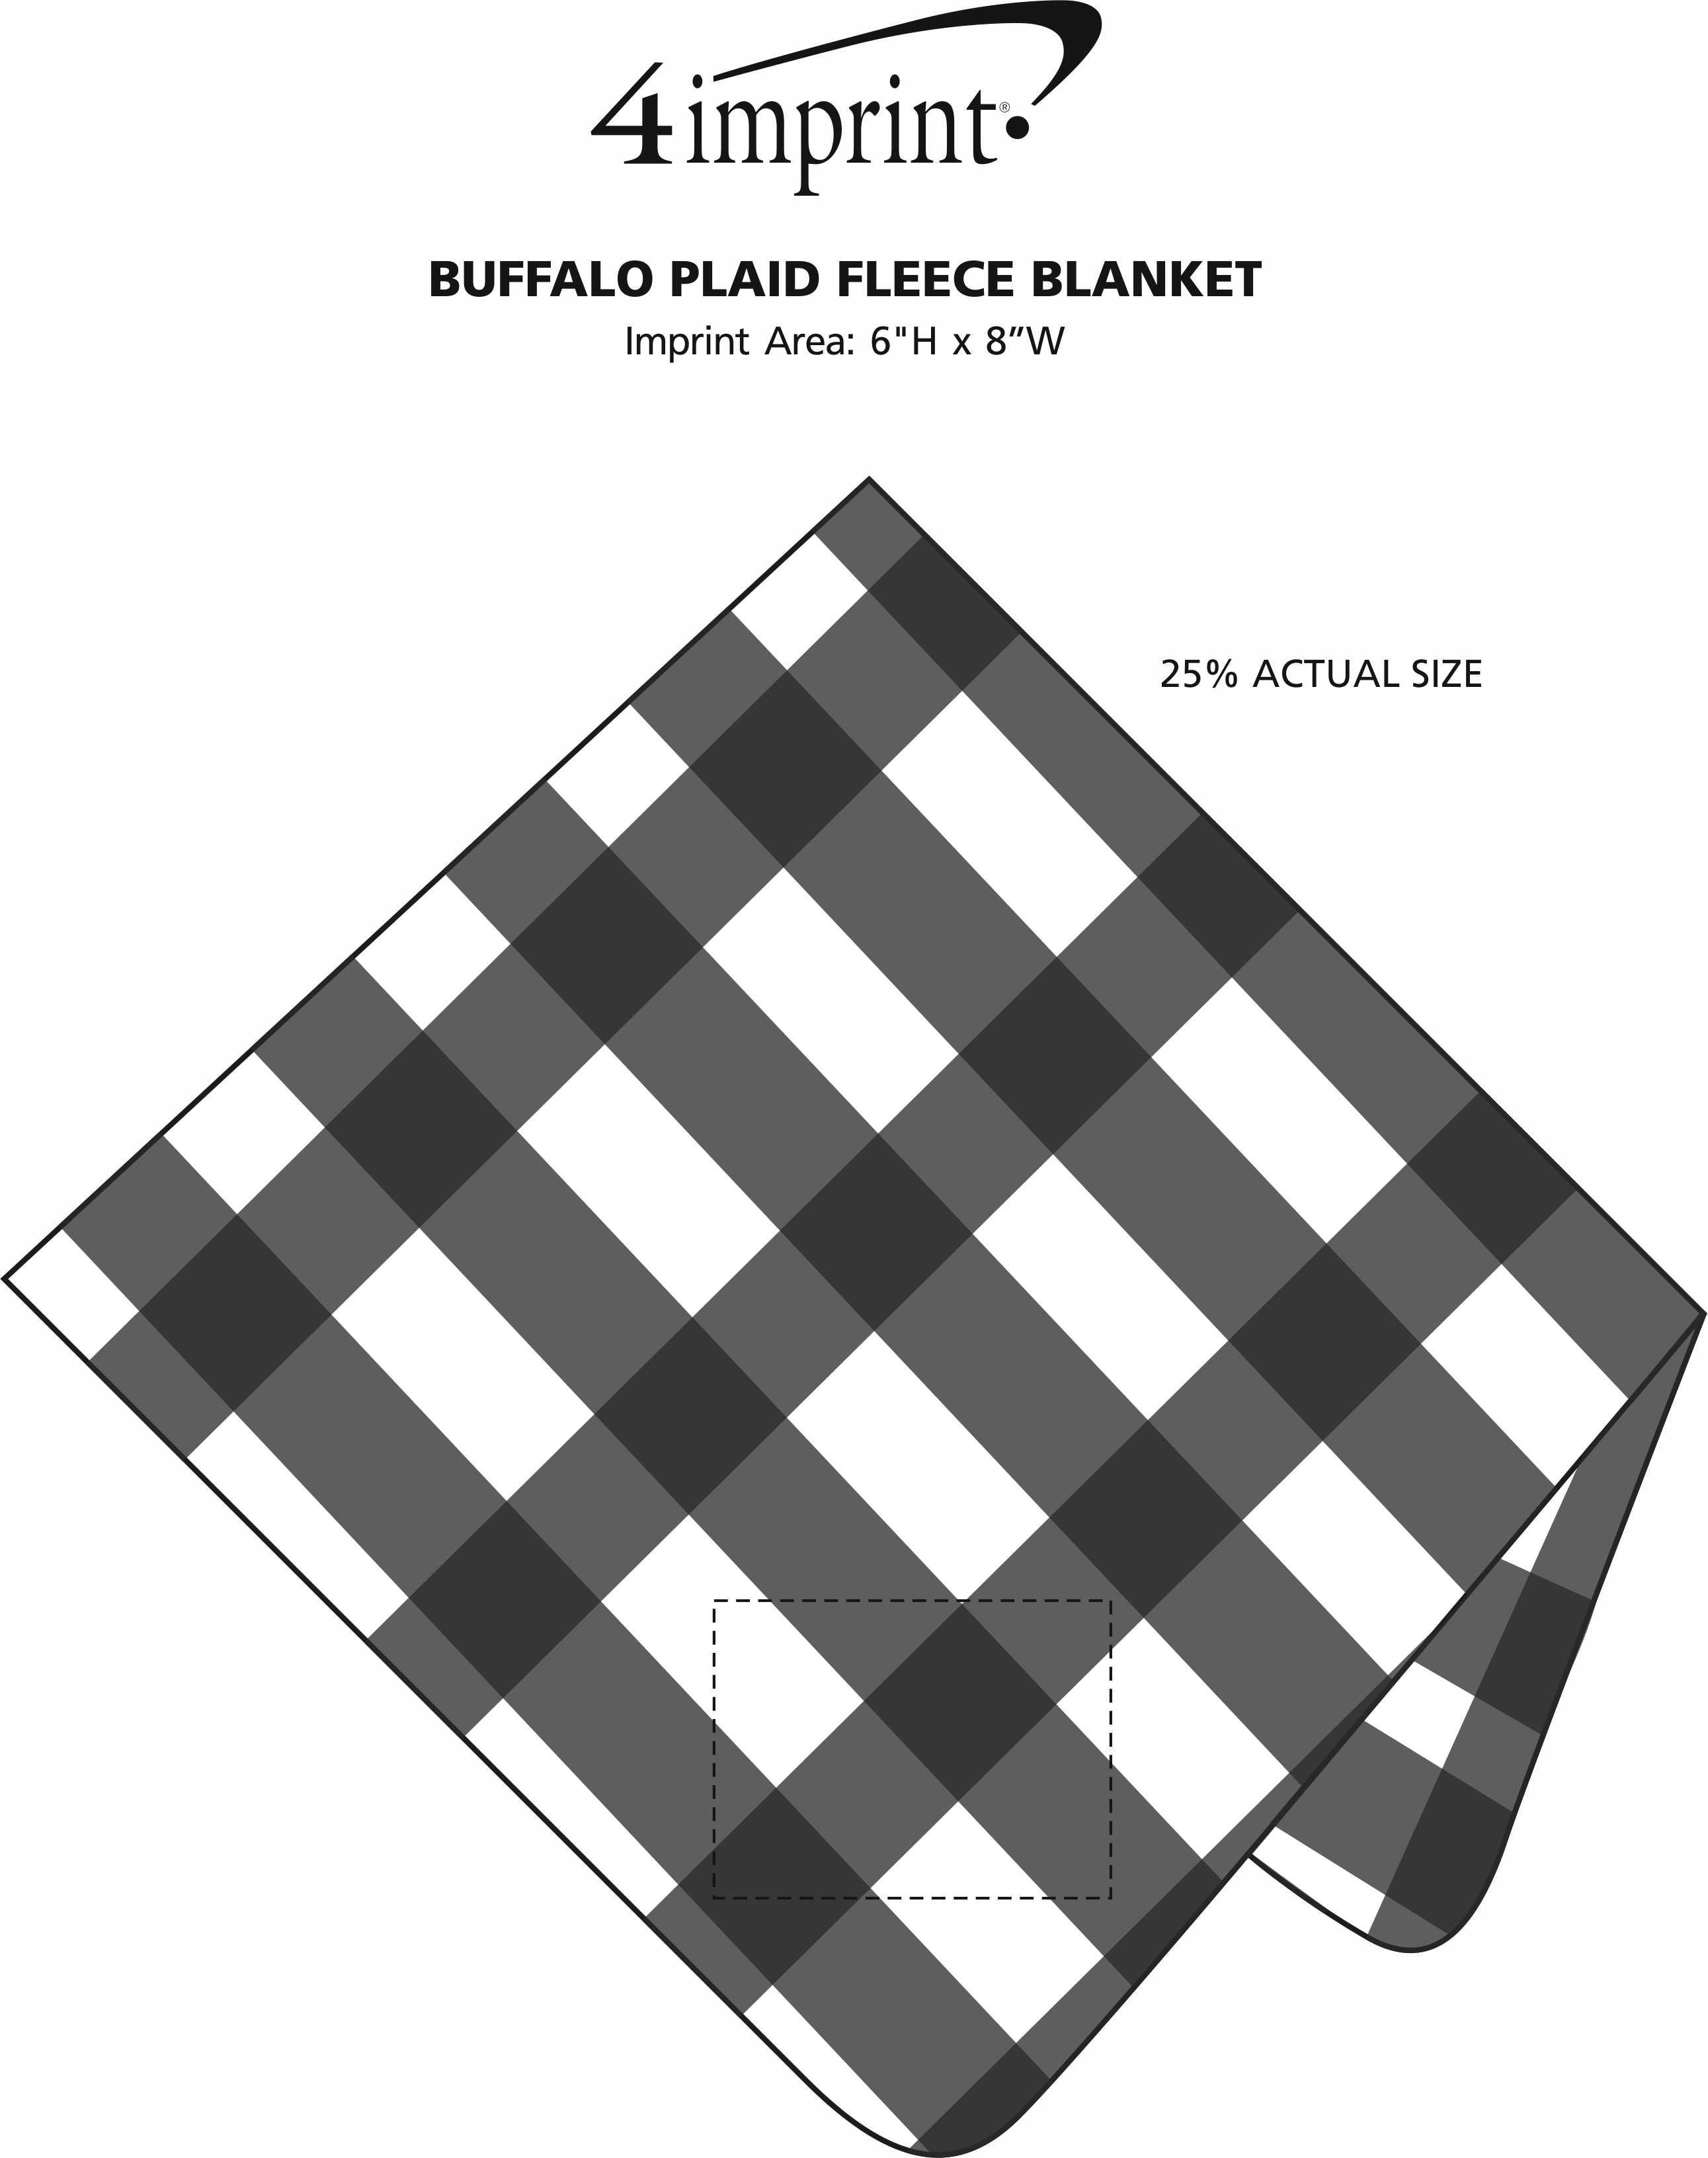 Imprint Area of Buffalo Plaid Fleece Blanket